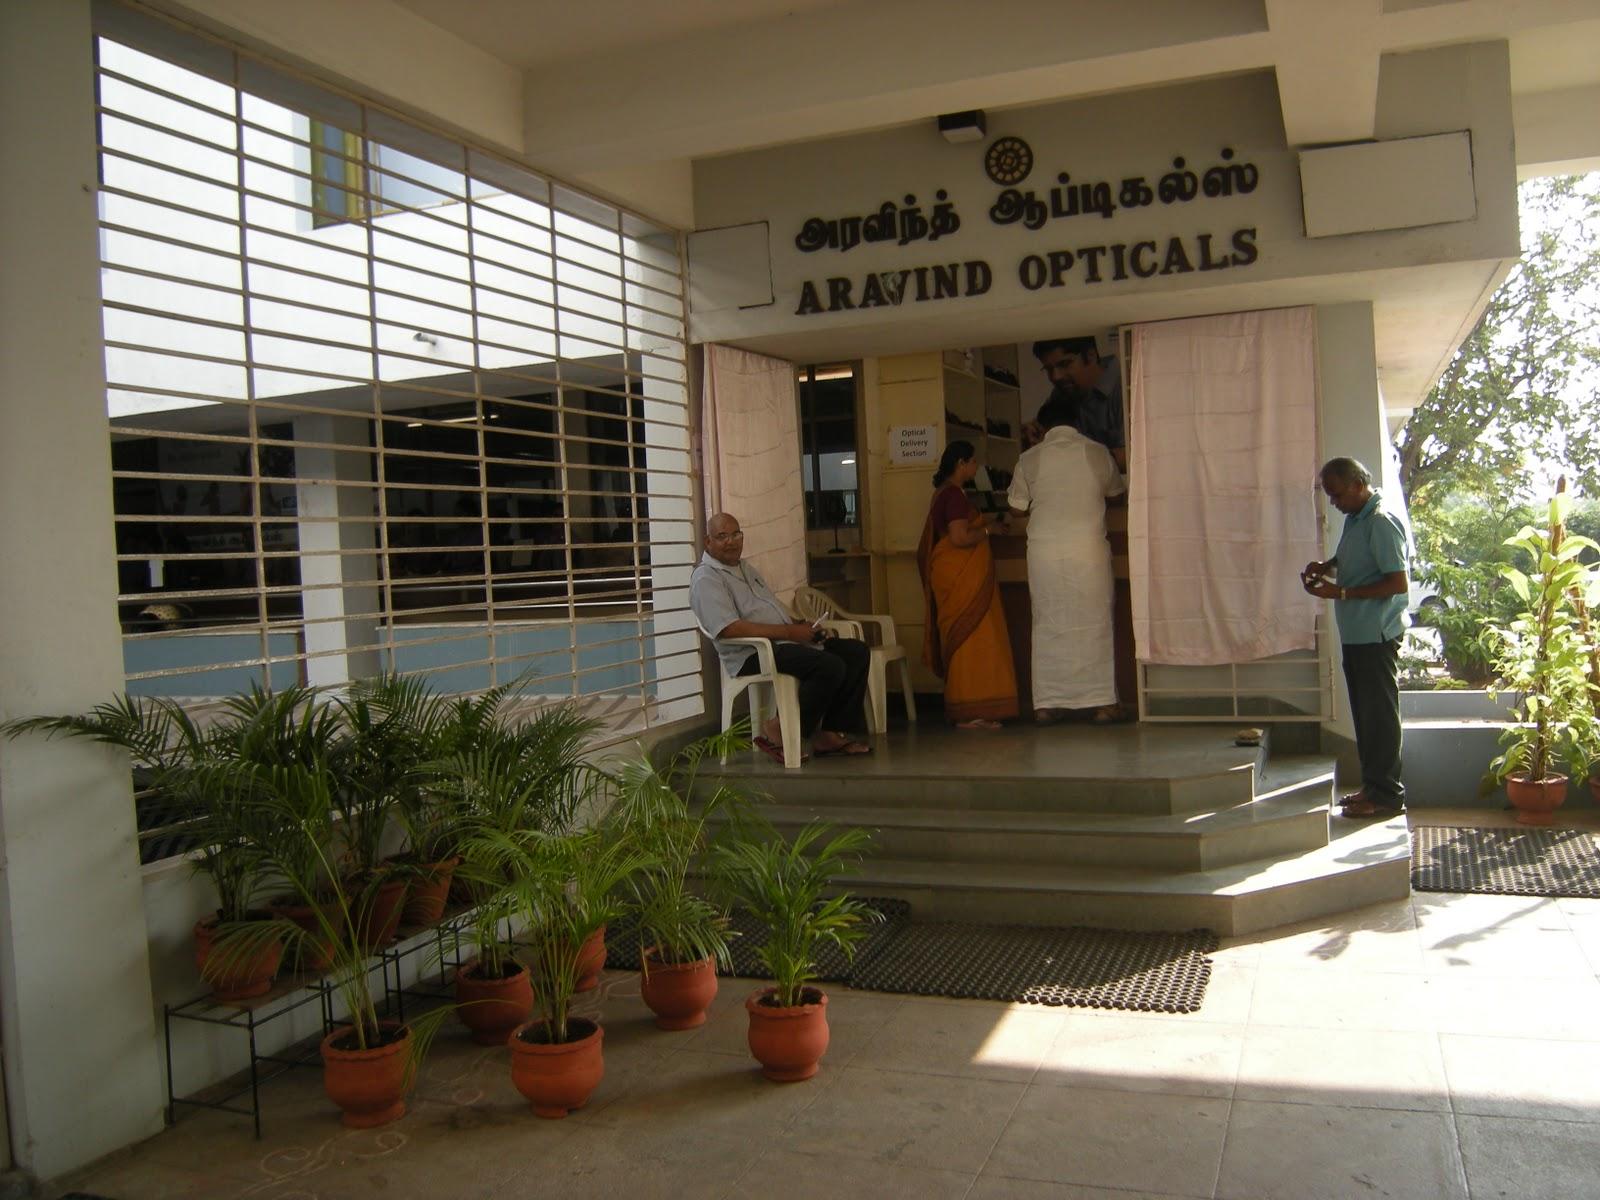 aravind eye hospital Studyguideindia: find information about aravind eye hospitals & pg institute of  ophthalmology,  apollo college of nursing , chennai, tiruvallur, tamil nadu.